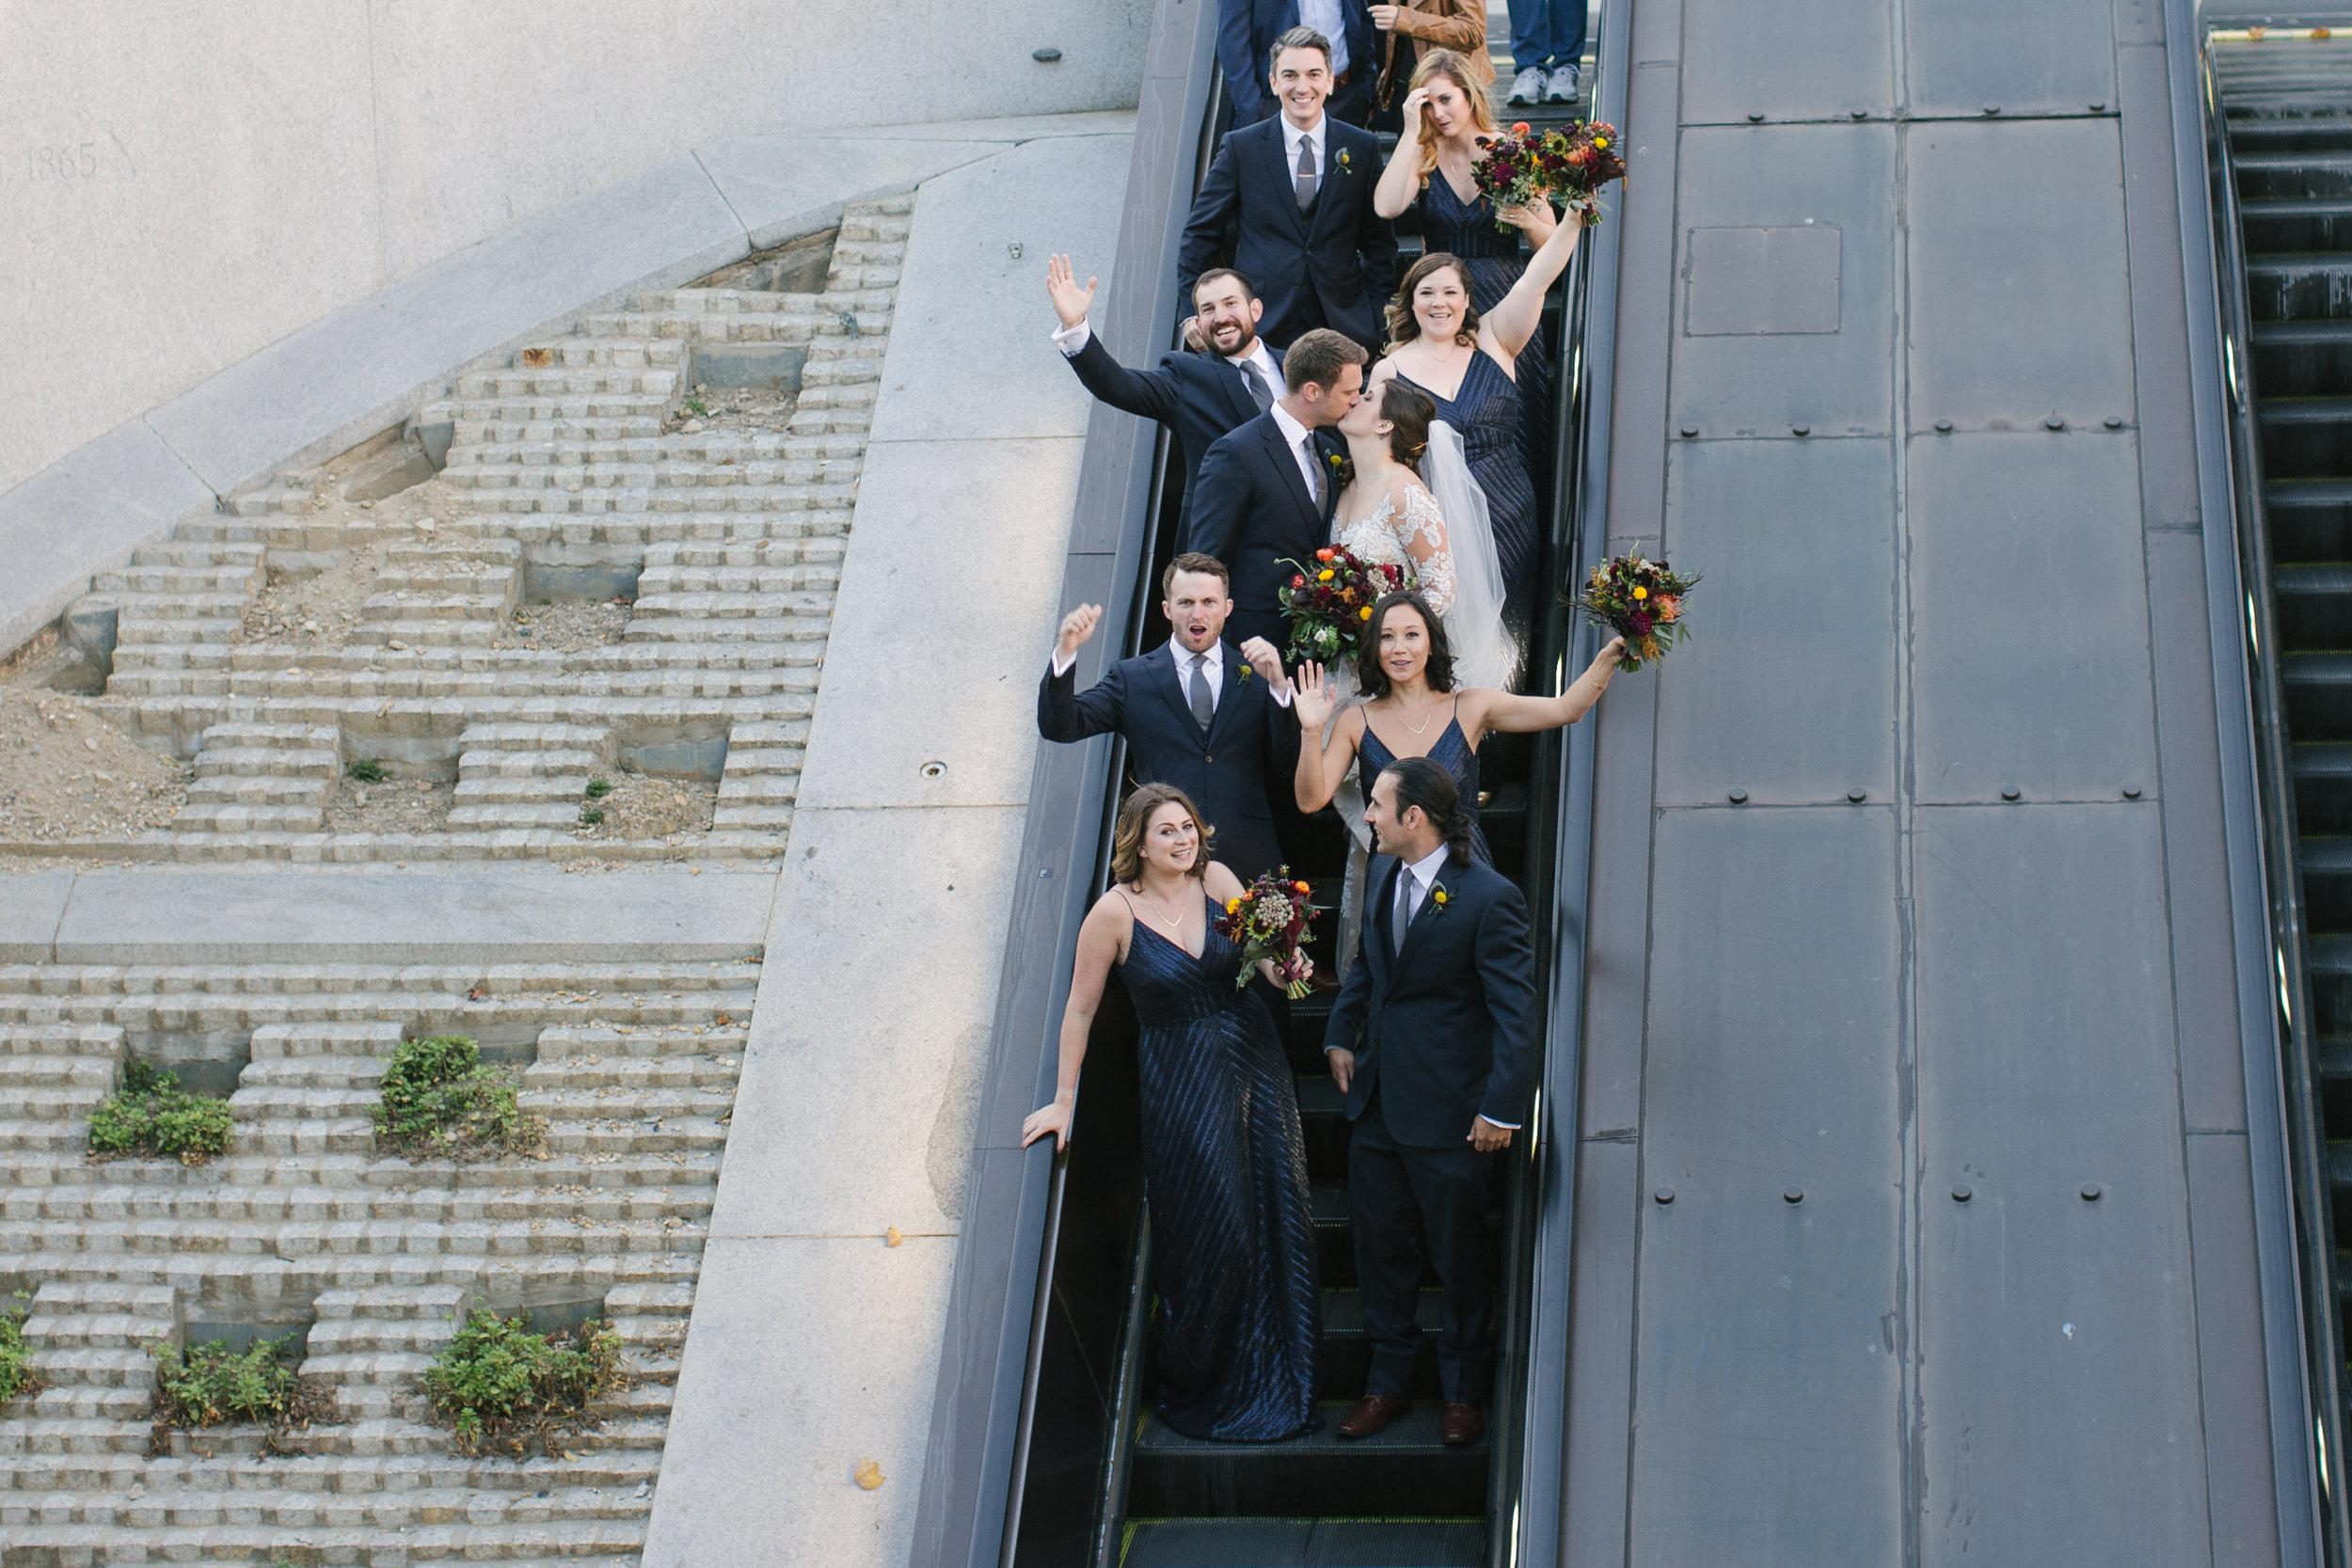 Dupon Circle Wedding | Washington DC Wedding Photography | Rebecca Wilcher Photography -17.jpg